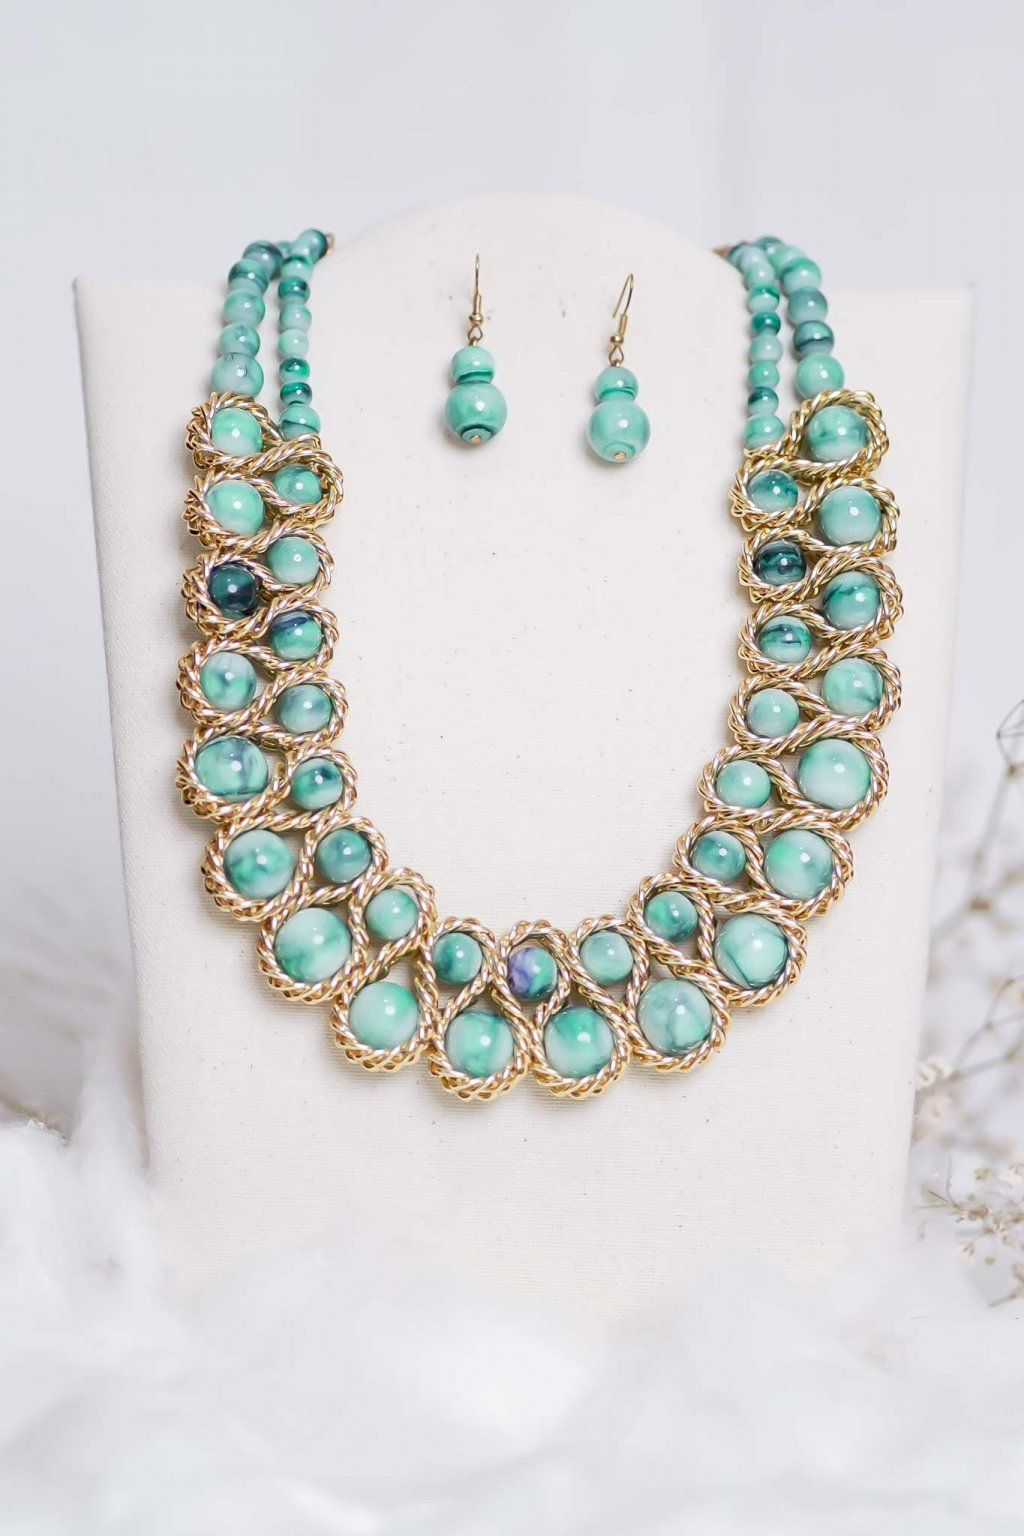 náhrdelník, šperk, spoločenská náhrdelník, náhrdelník na bežný deň, výrazný náhrdelník, jemný náhrdelník, šperky, náhrdelník na ples, svadbu, stužkovú 56